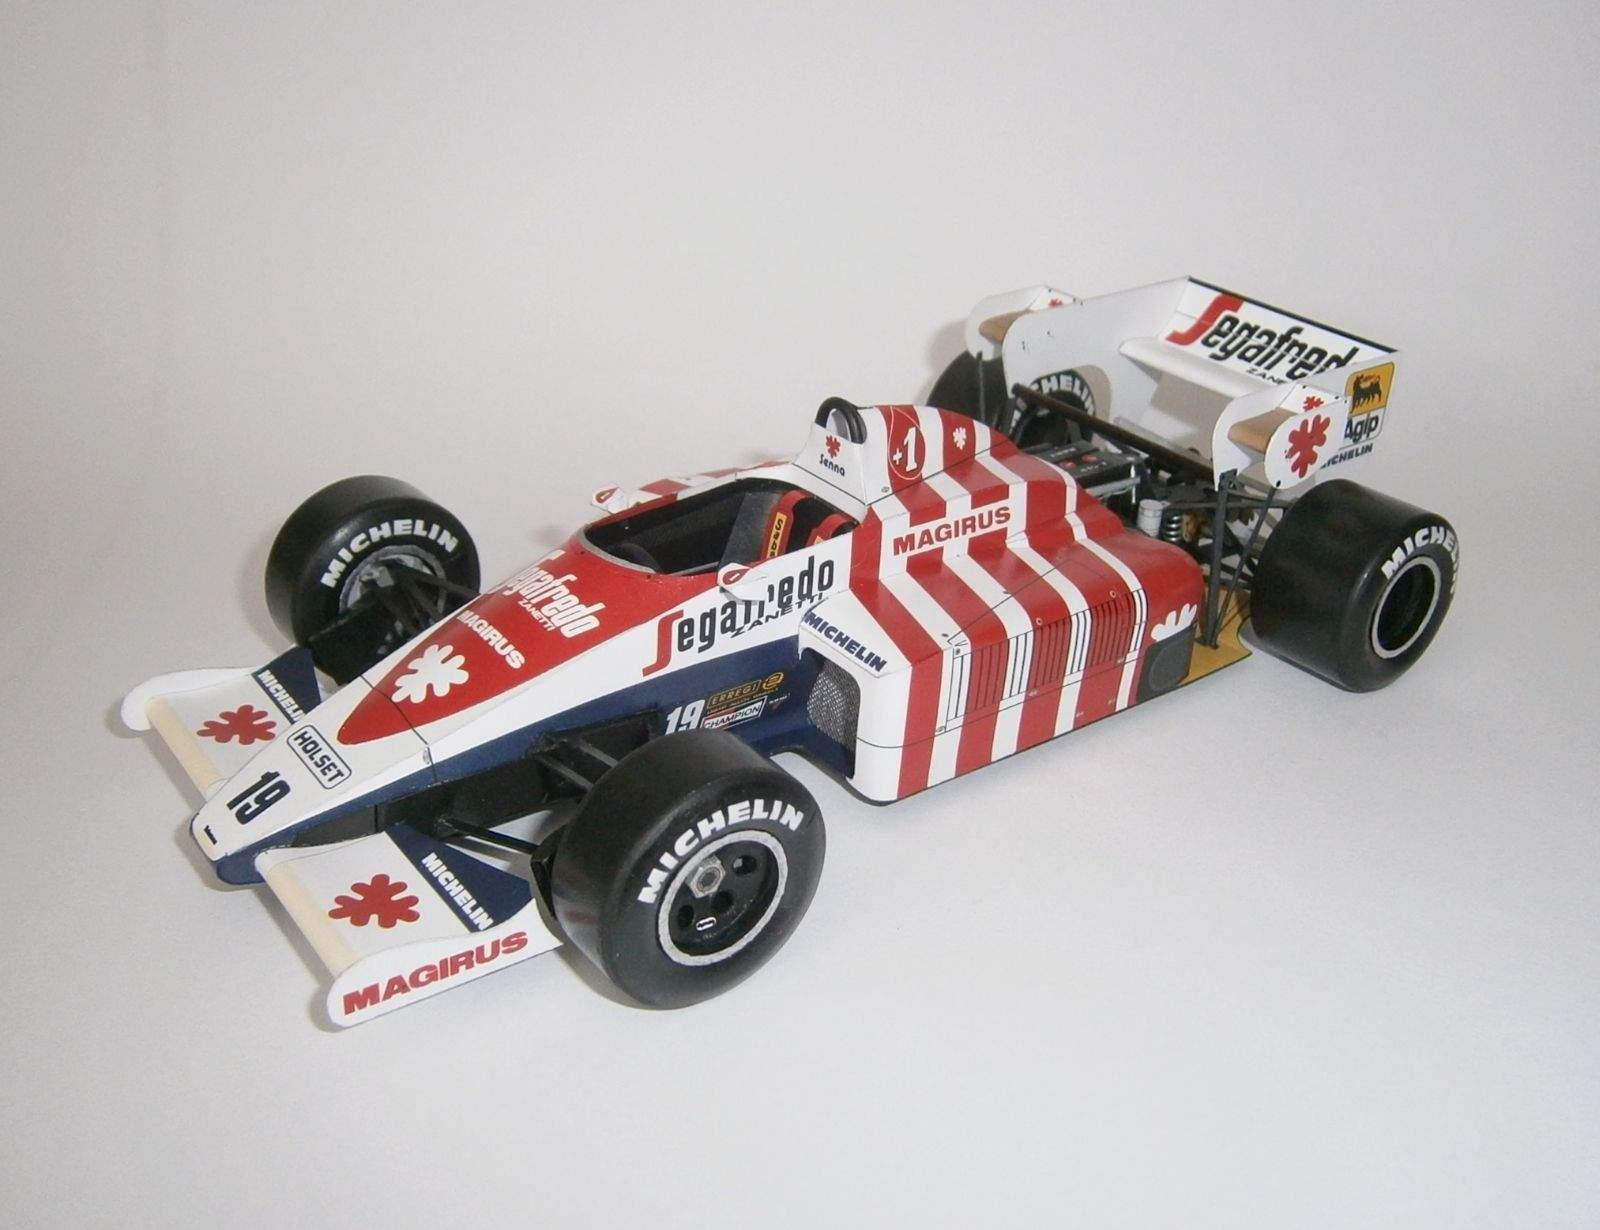 Toleman TG184 - A.Senna, GP Portugal 1984